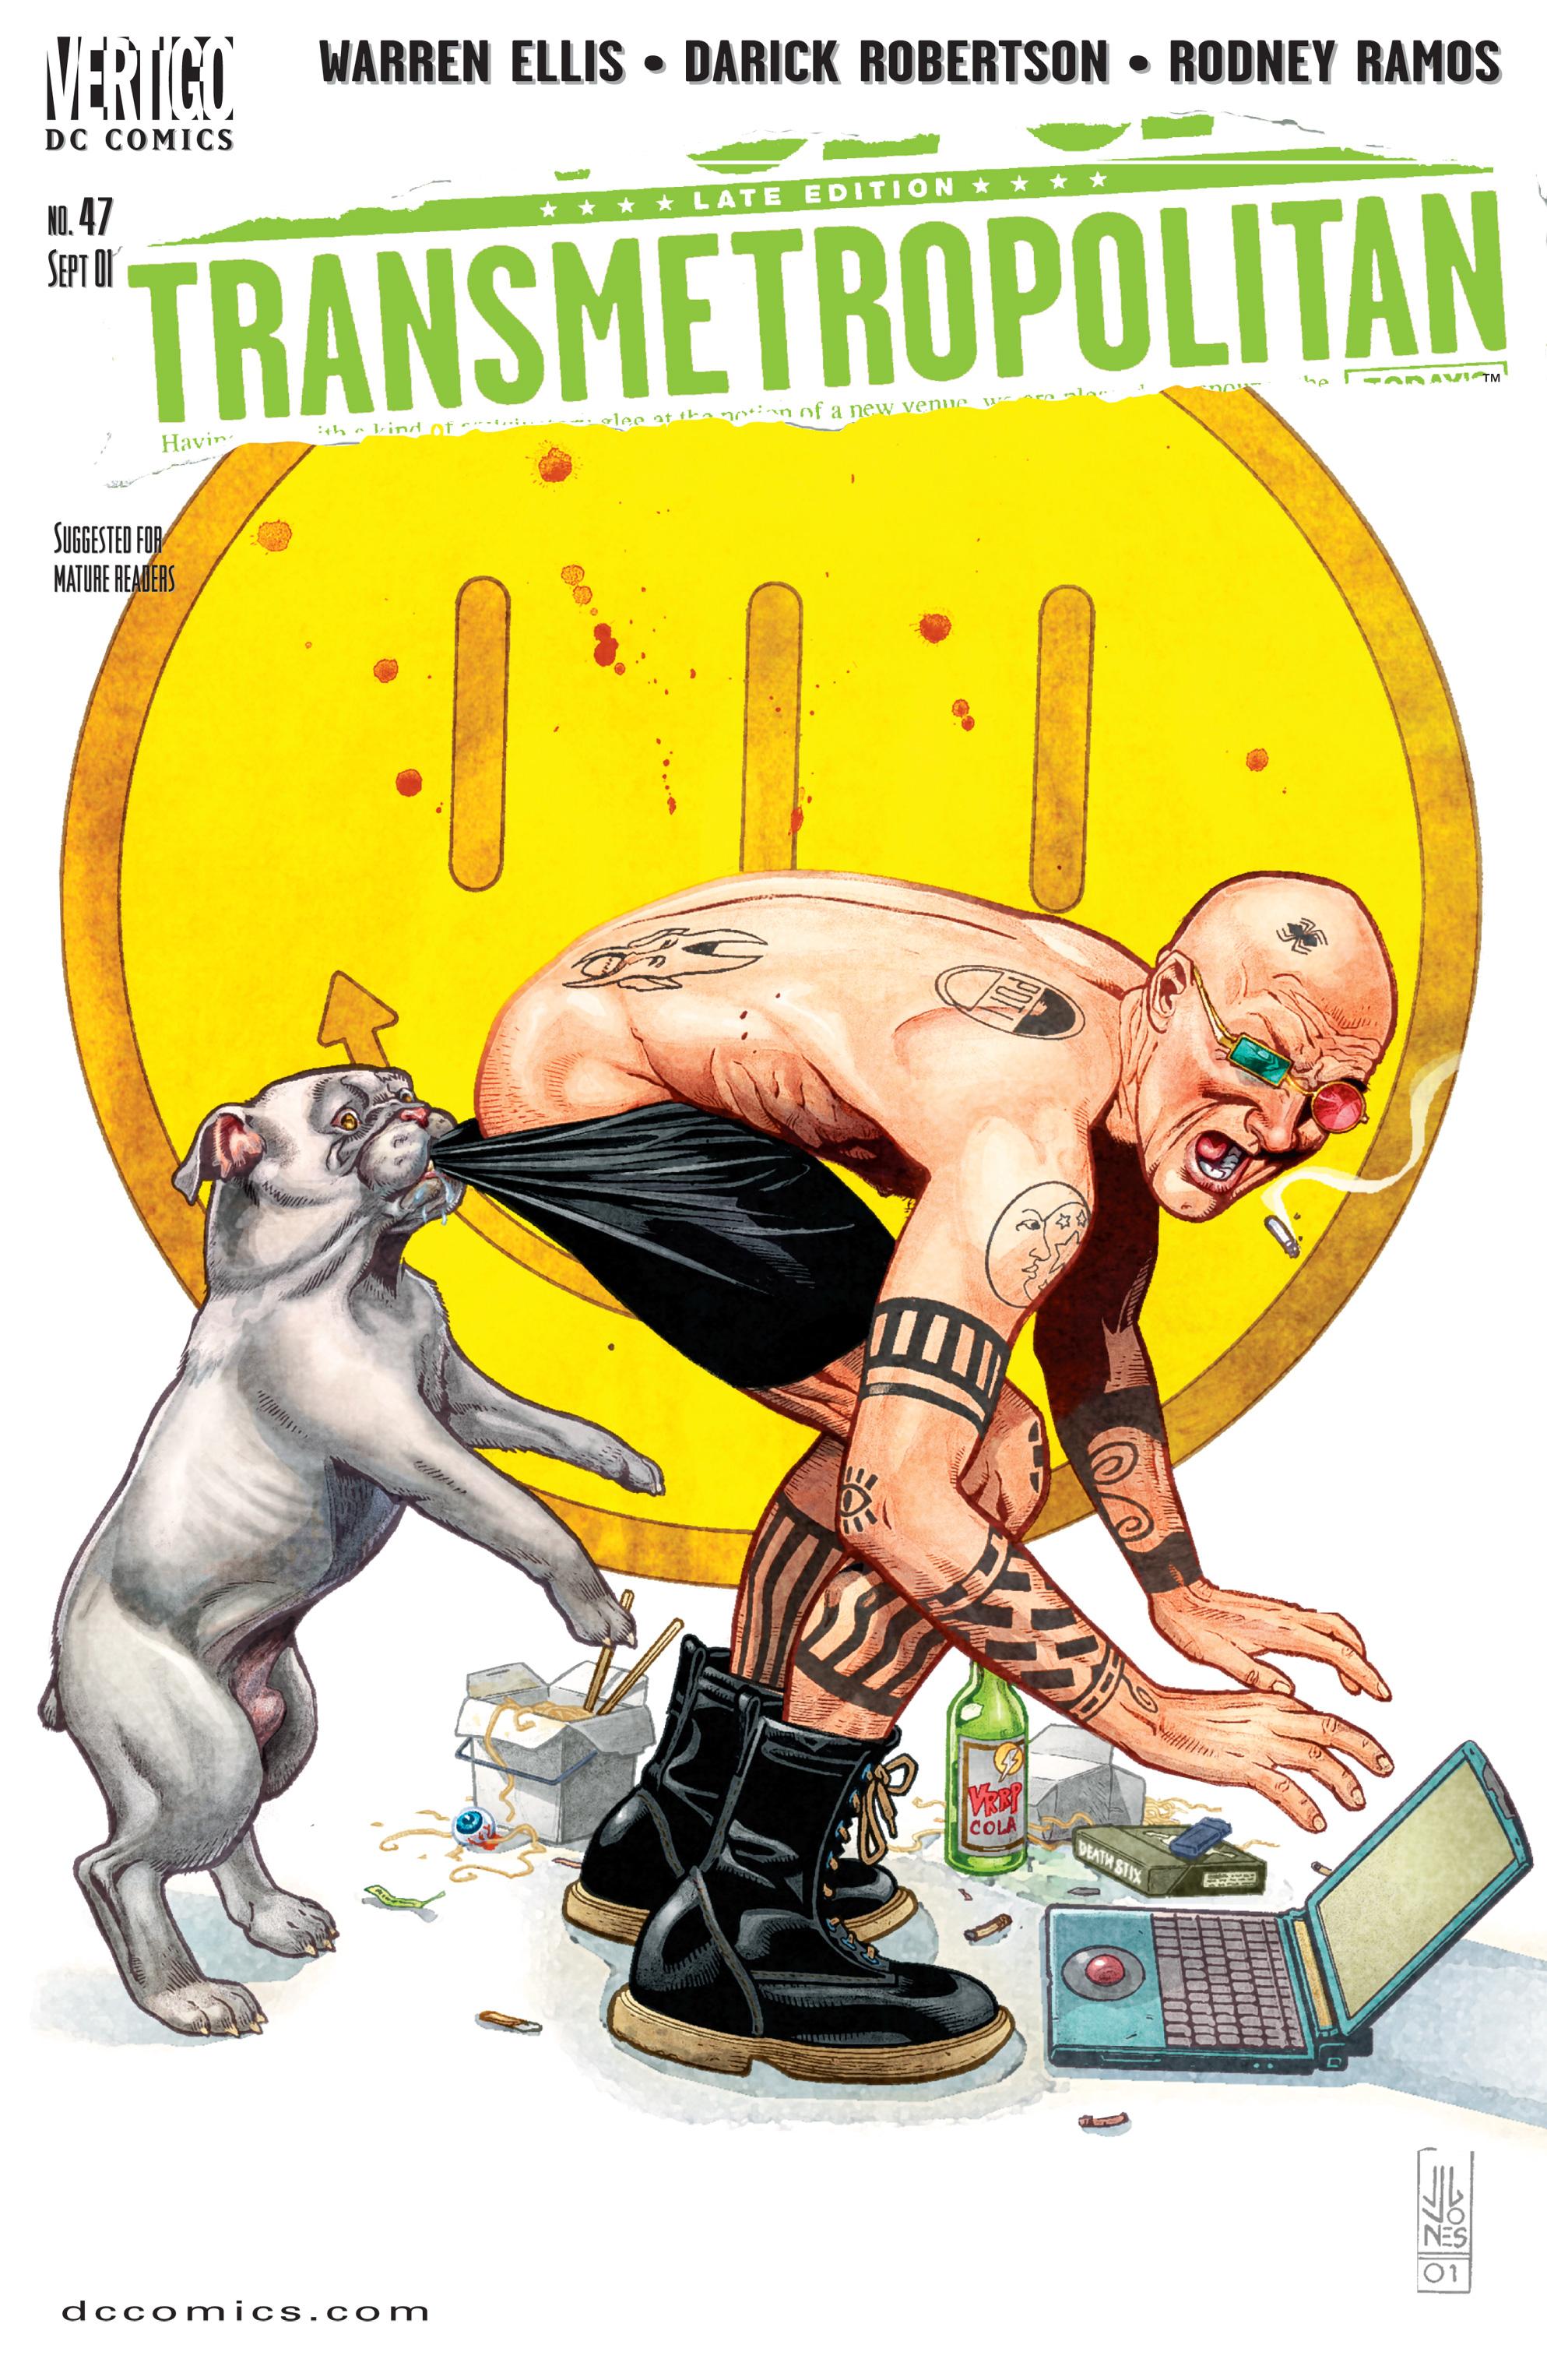 Read online Transmetropolitan comic -  Issue #47 - 1